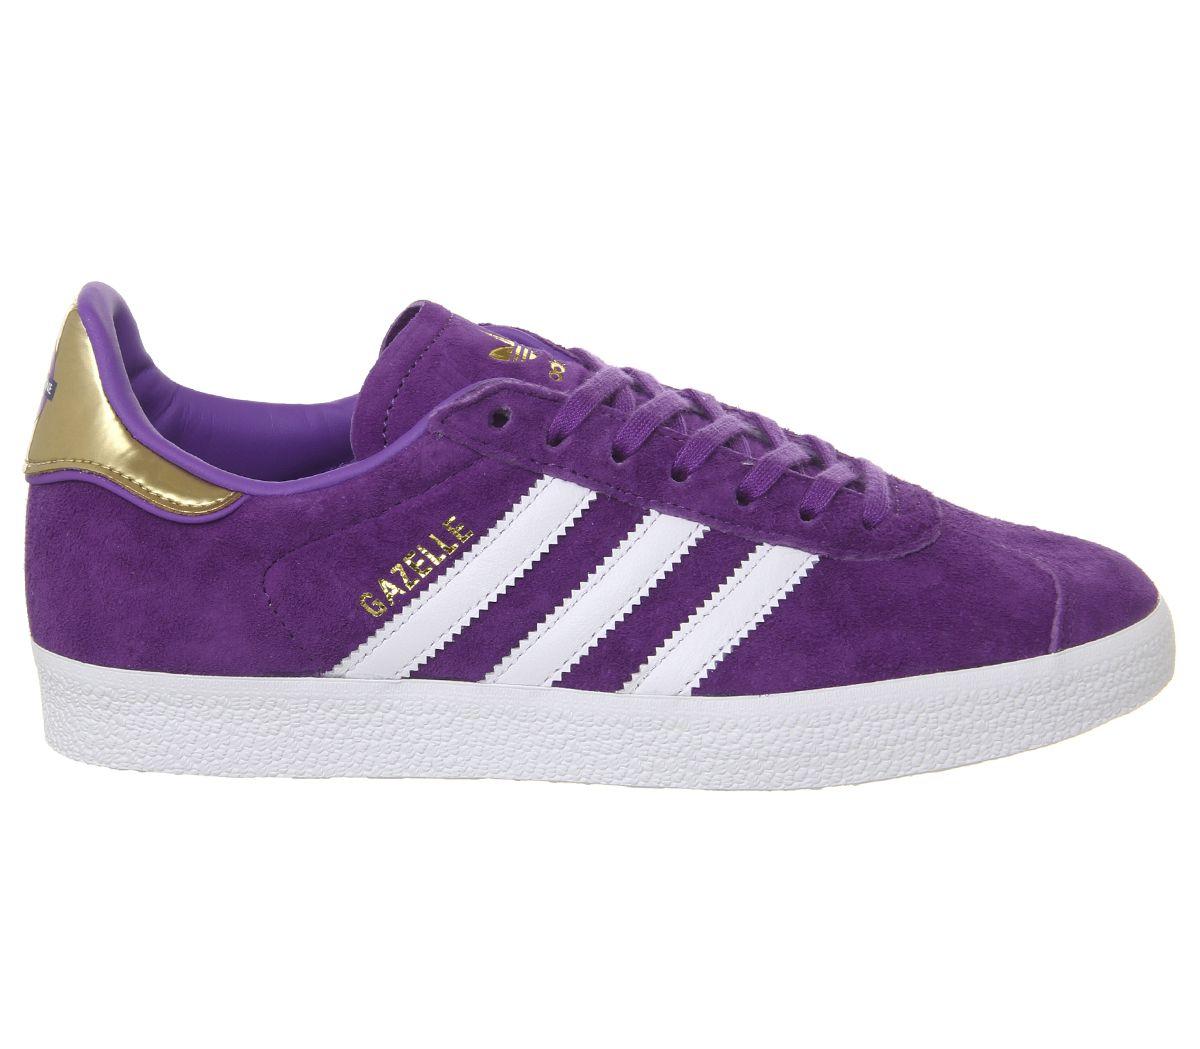 Mens Adidas Gazelle Trainers White Purple Gold Metallic Elizabeth Tfl Trainers S